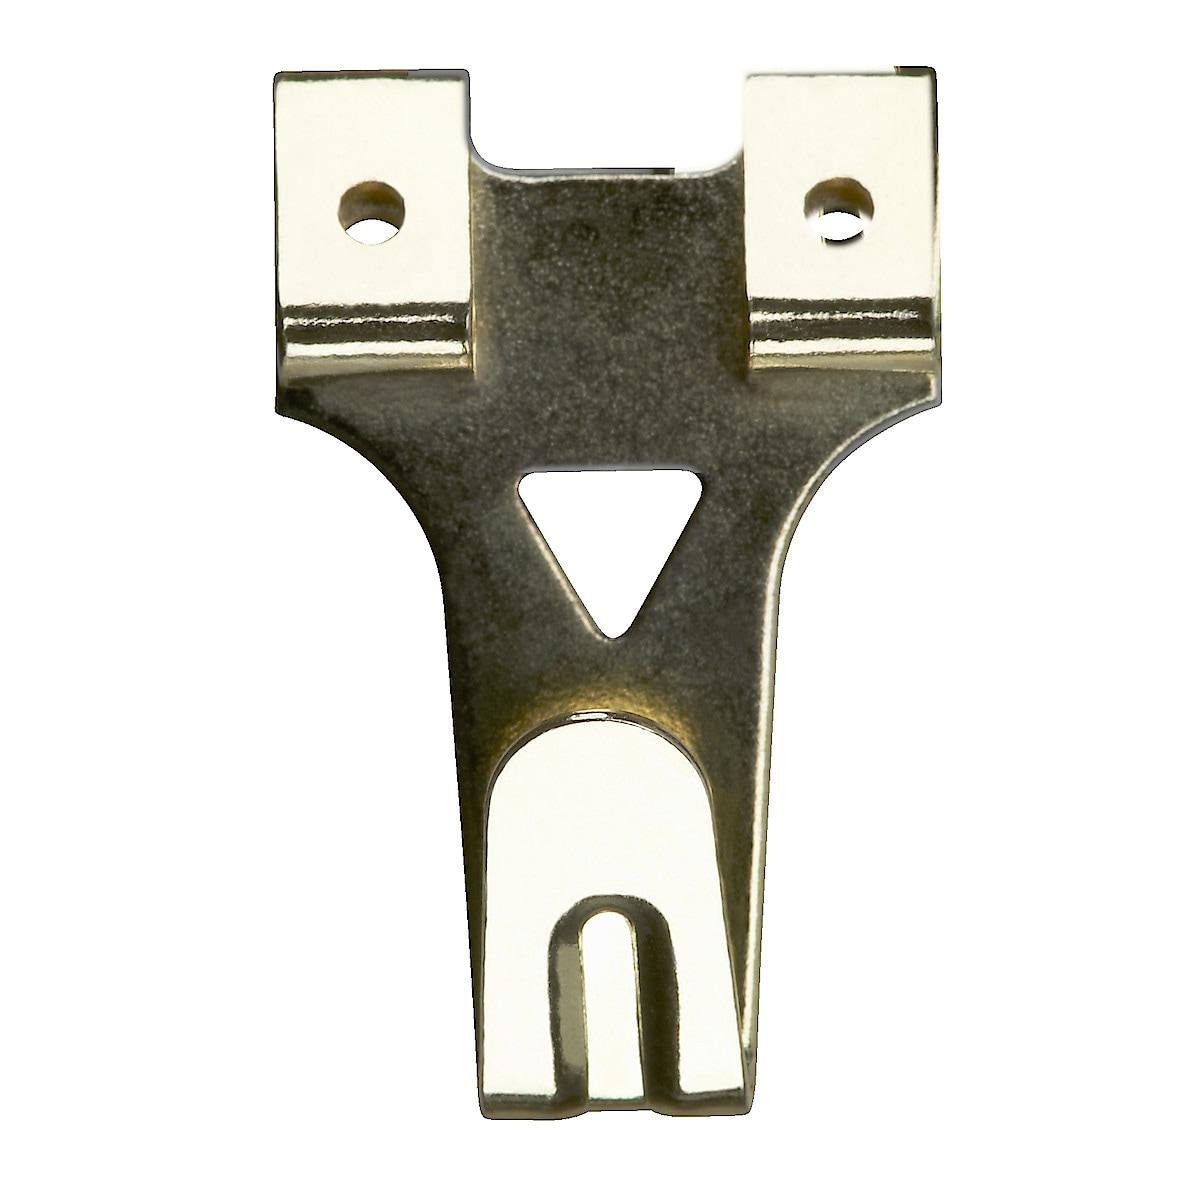 X-krok formessinget jern